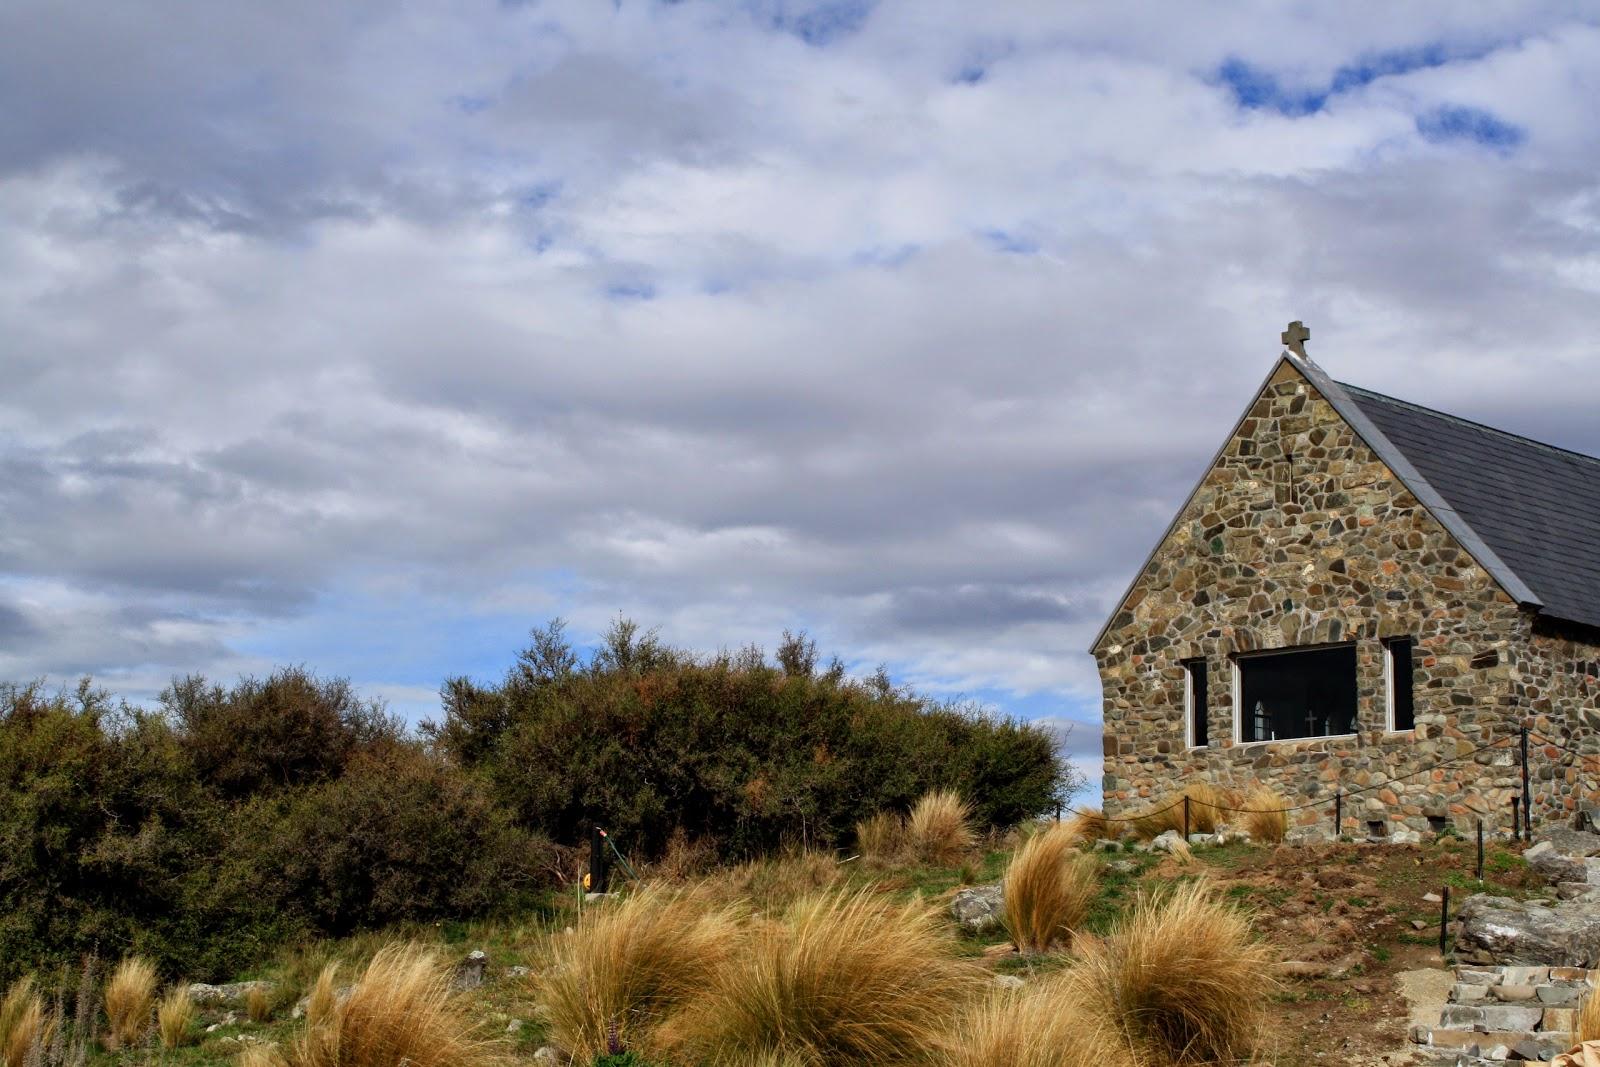 The outside of The Church of the Good Shepard at Lake Tekapo.